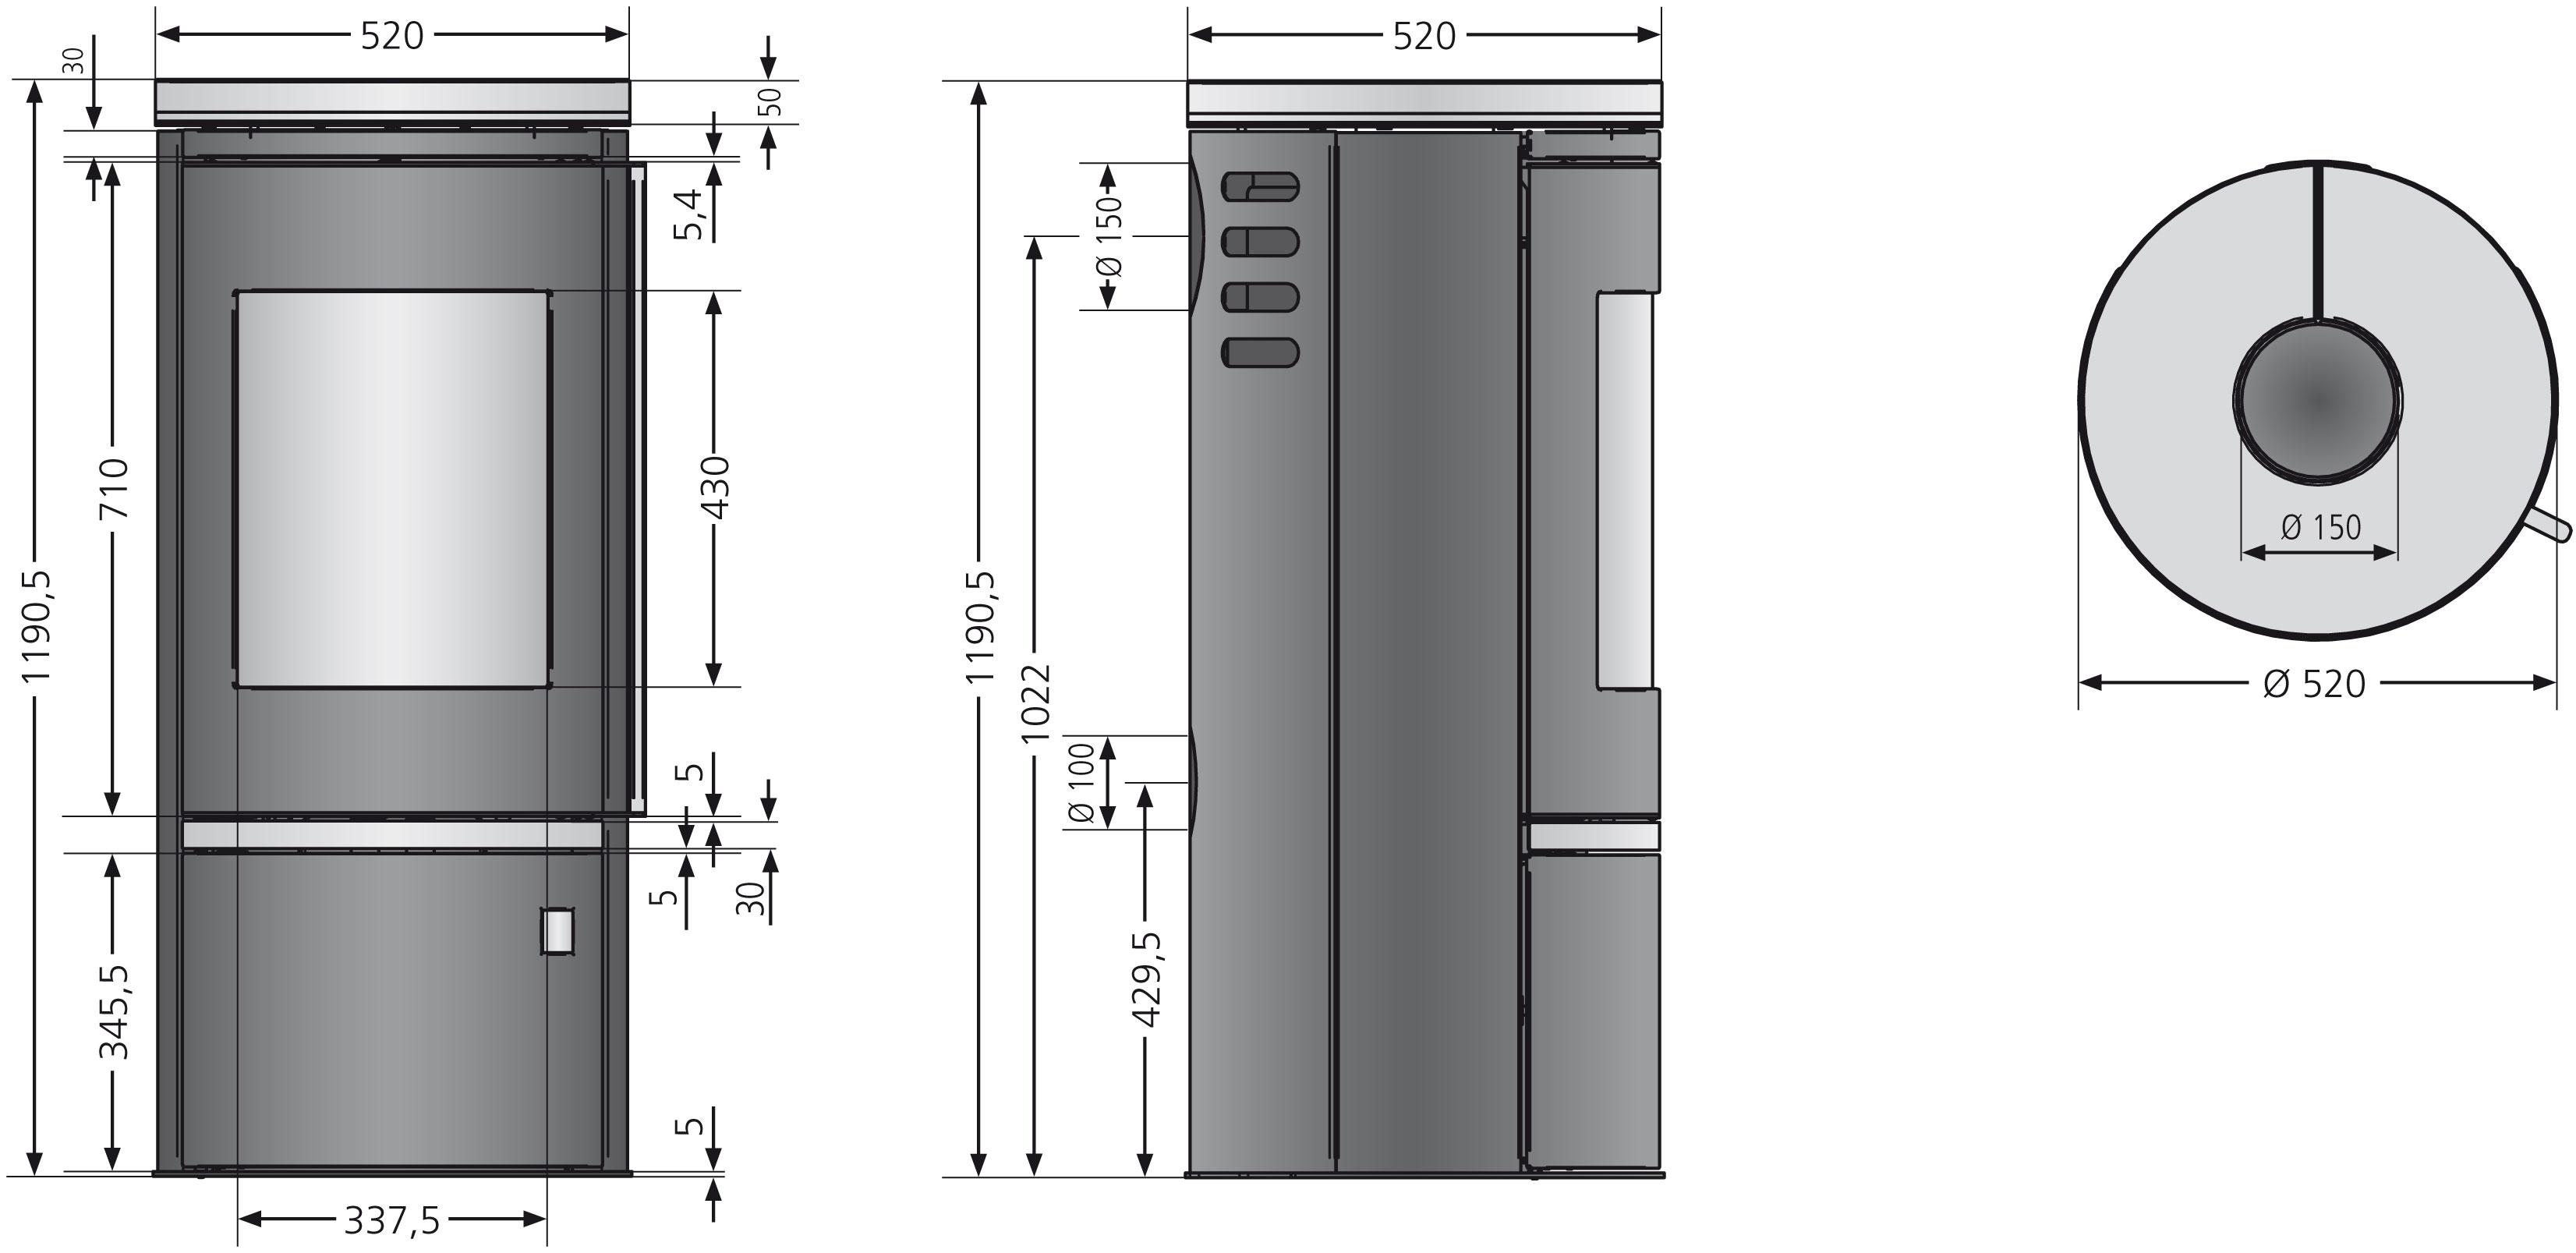 Kaminofen Justus Faro Top 2.0 raumluftunabh. Stahl schwarz 6kW Bild 3